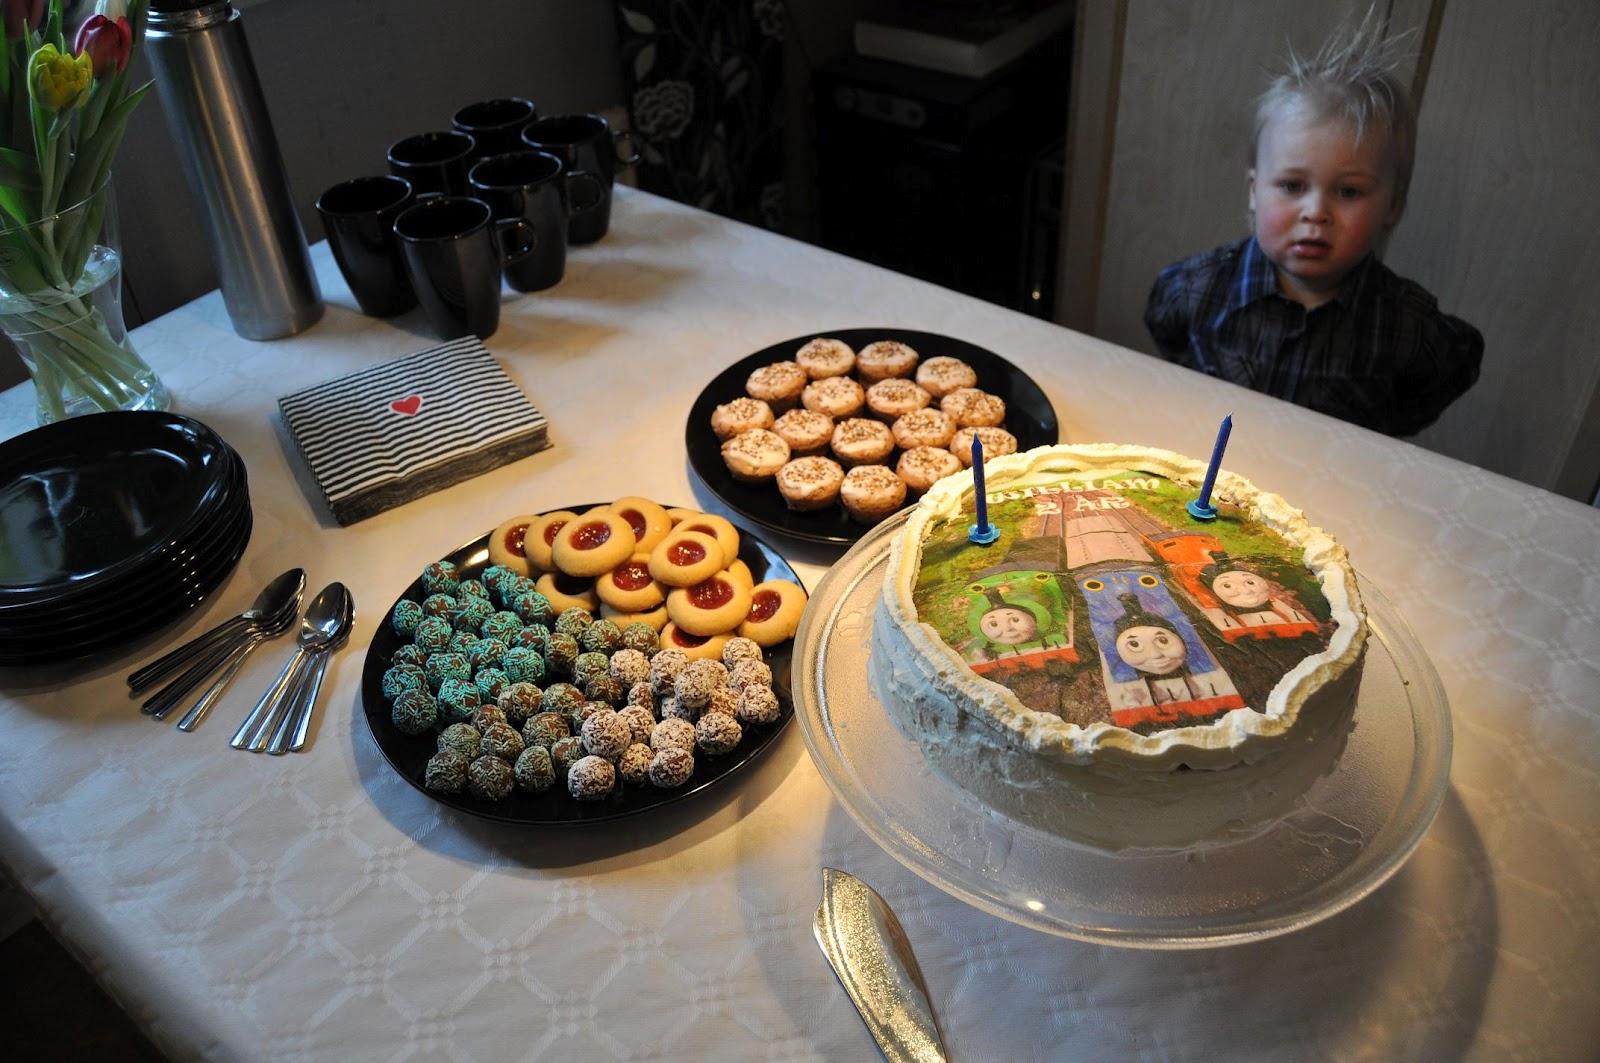 kalas 11 år kille Misan Maries blog: 2 års kalas med Thomas tåget! kalas 11 år kille